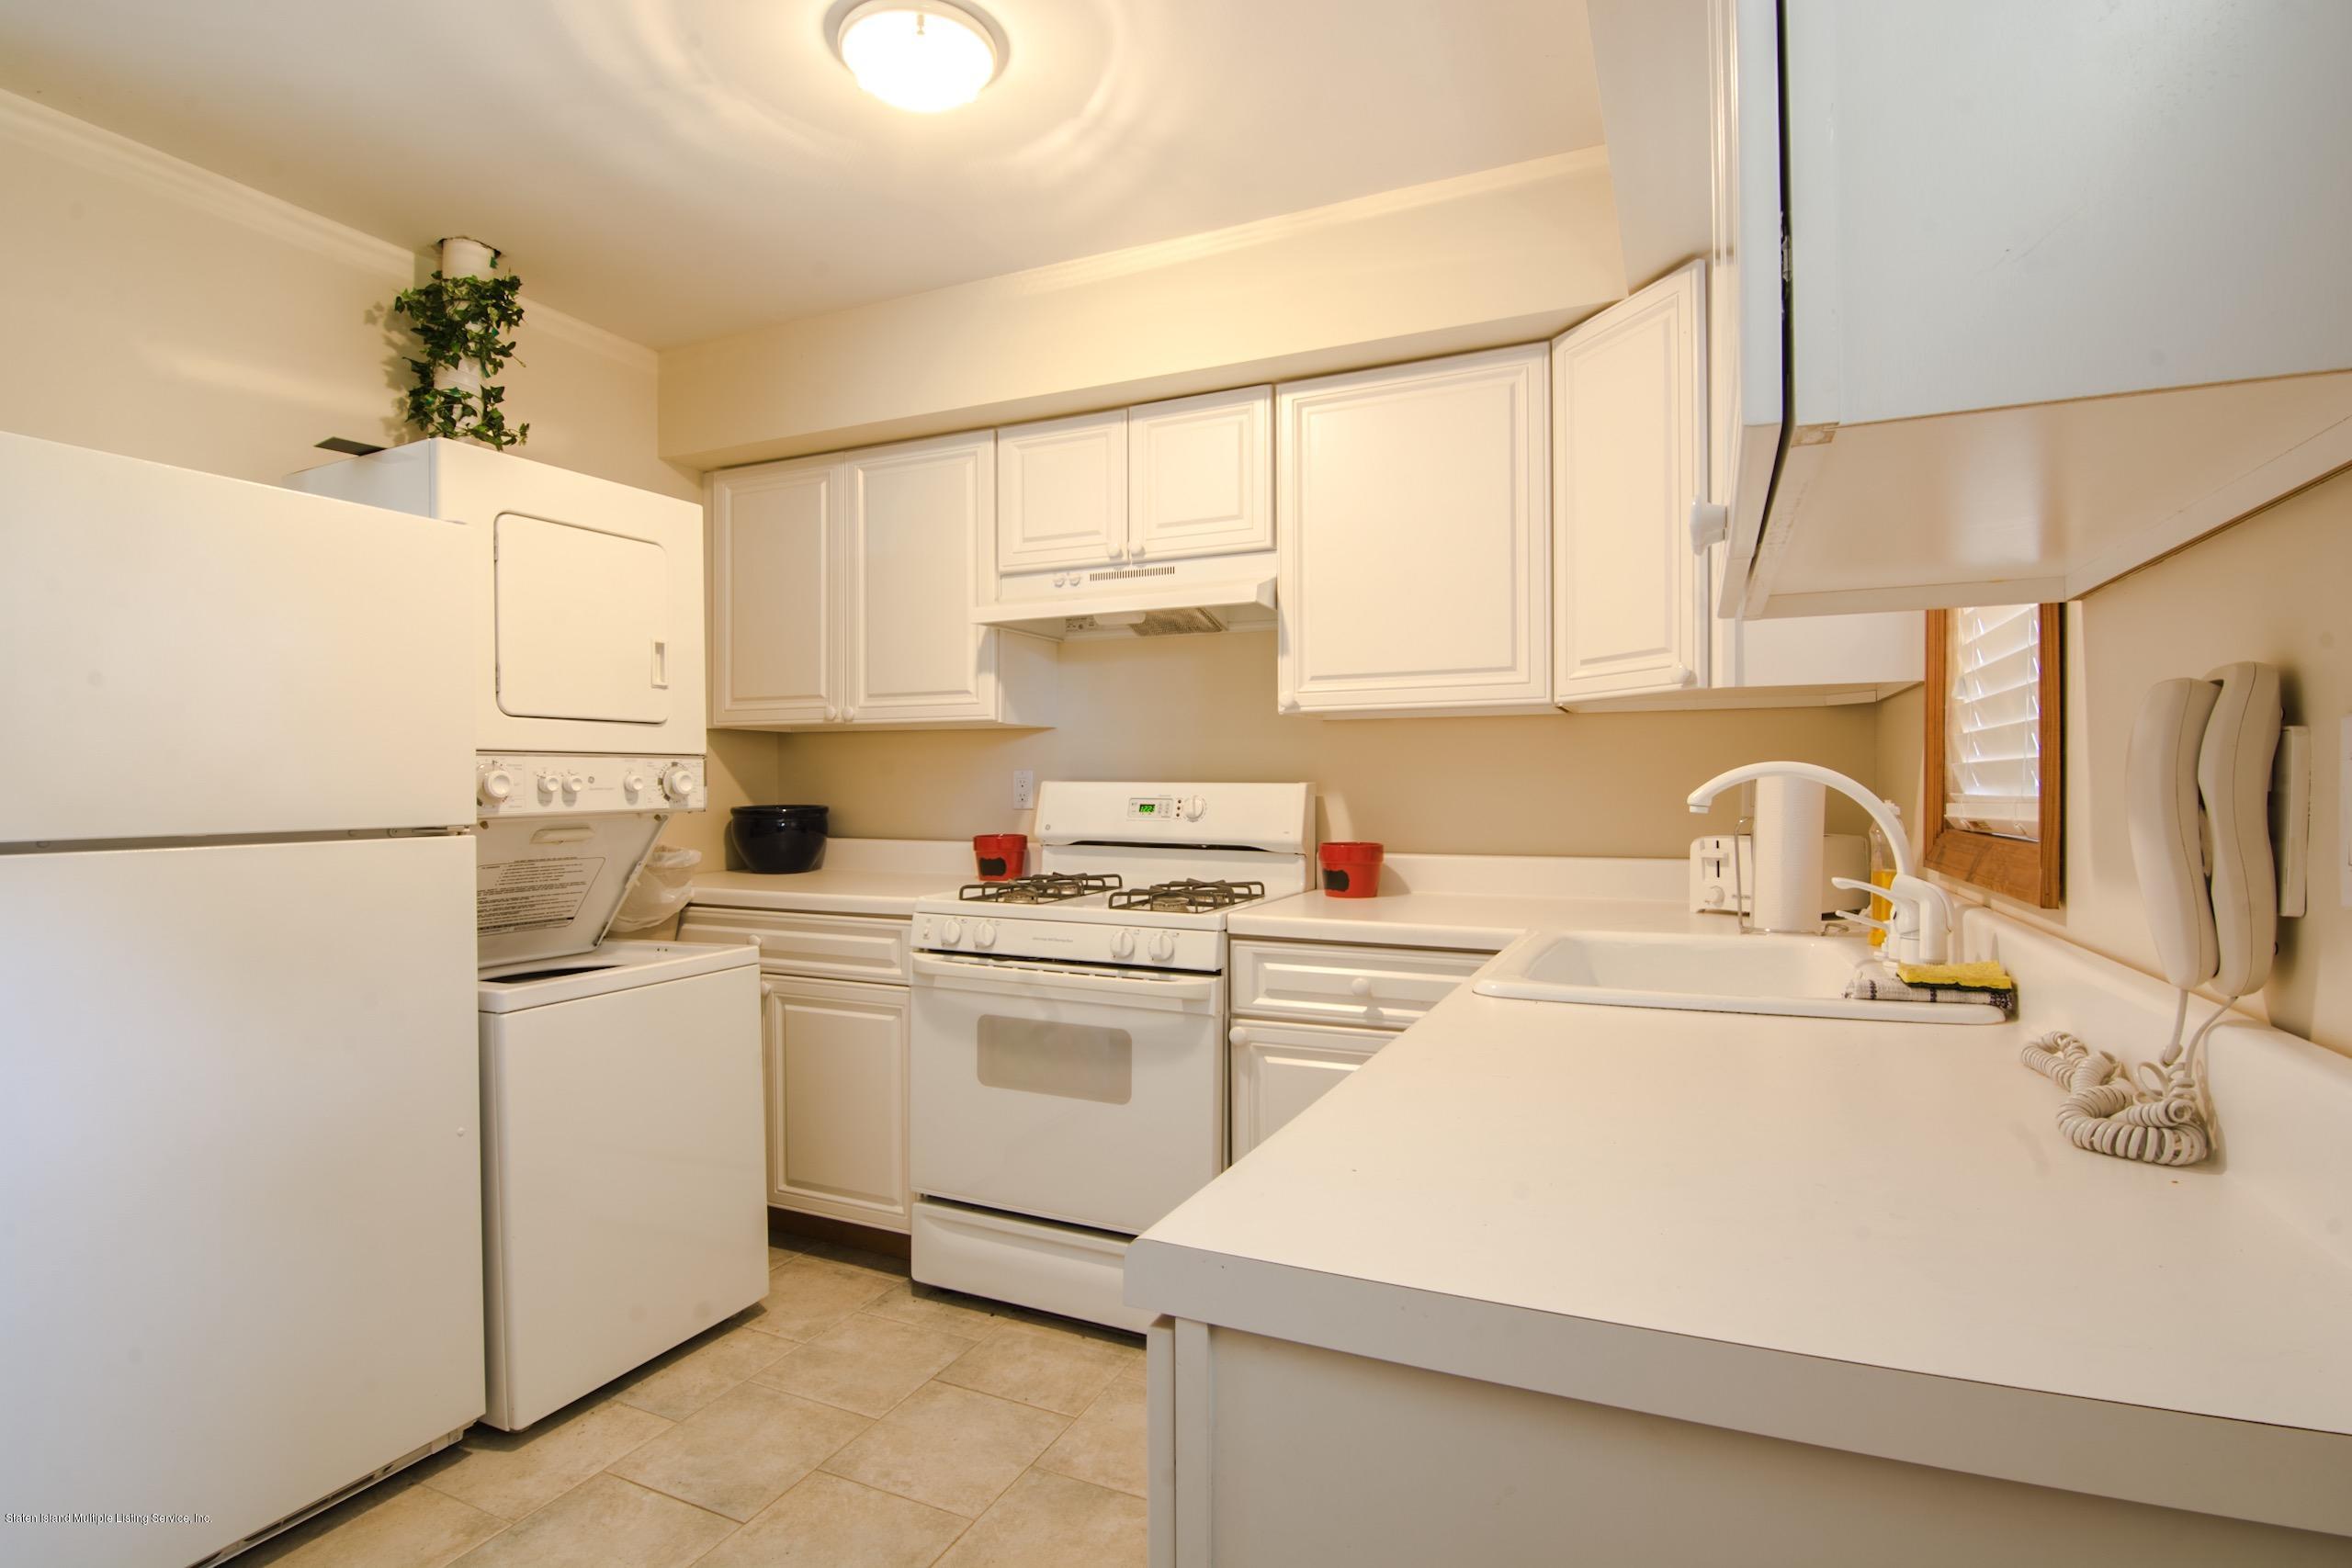 Single Family - Detached 120 Milden Avenue  Staten Island, NY 10301, MLS-1121068-20